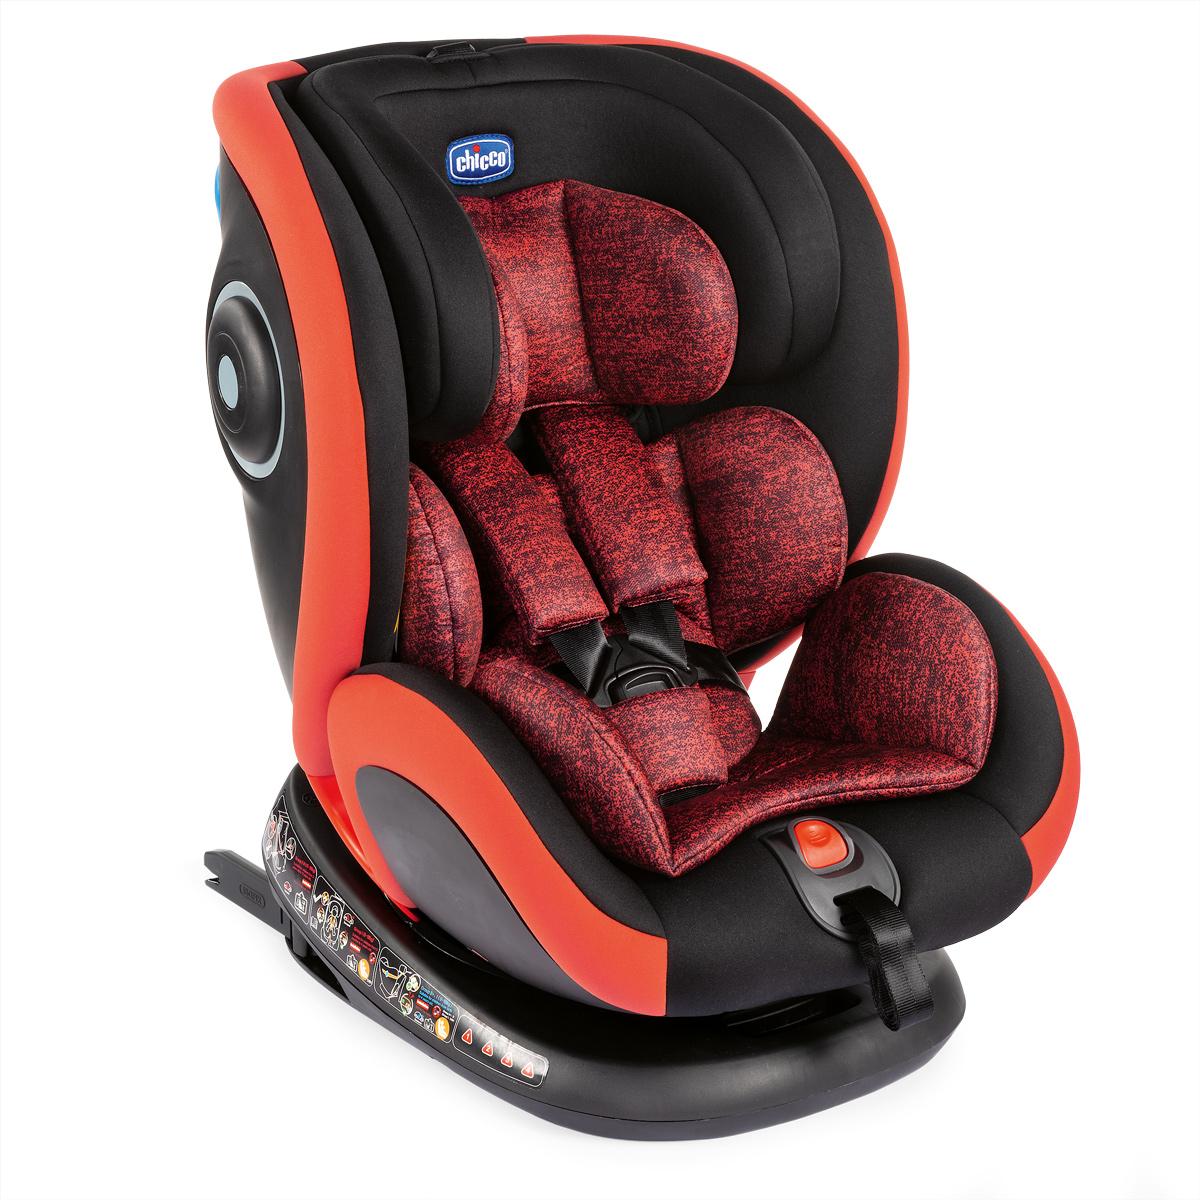 Scaun auto isofix rotativ Chicco Seat4Fix, PoppyRed, grupa 0+/1/2/3, 0-36Kg